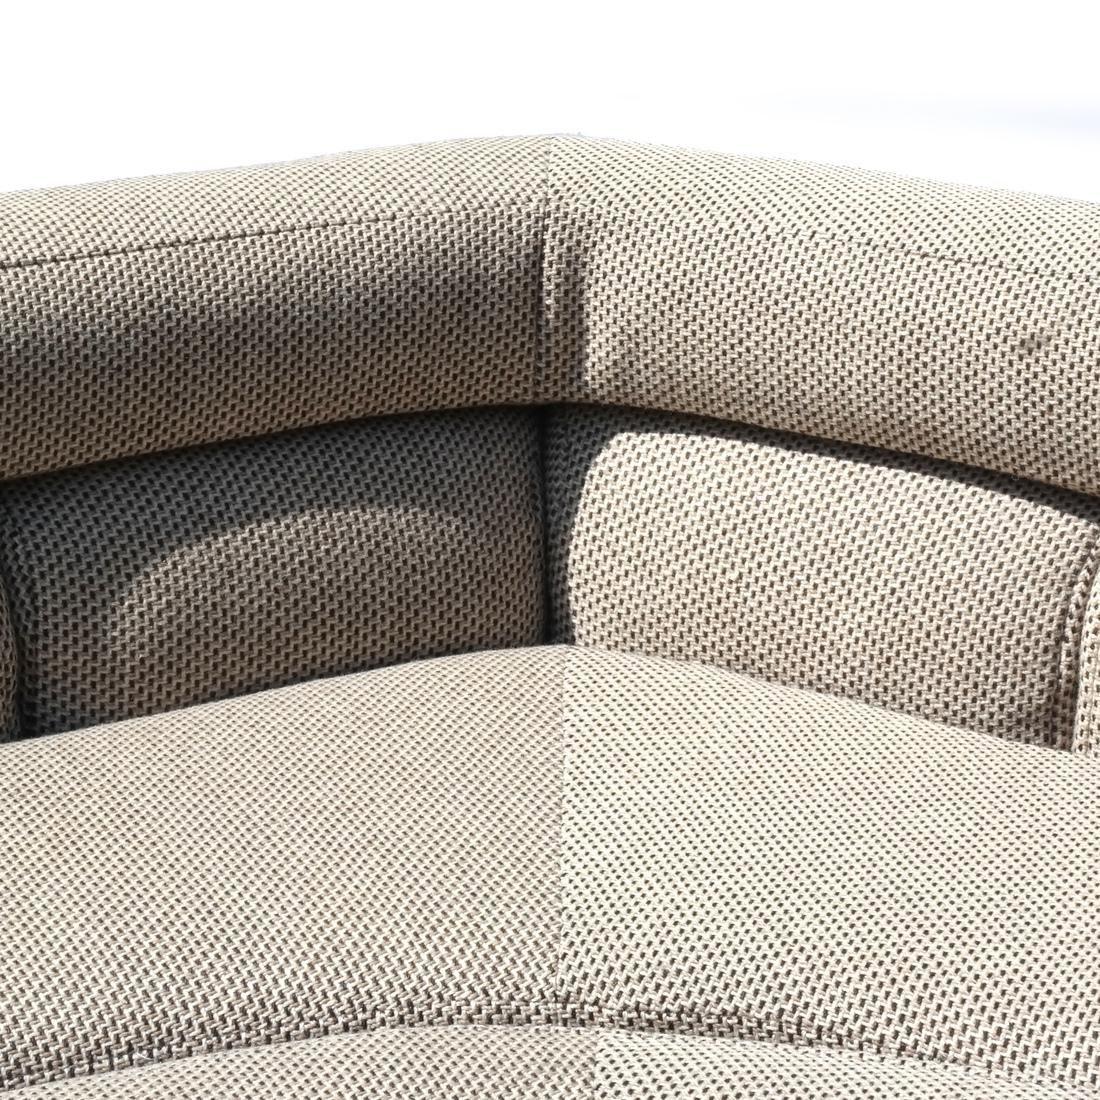 Vladimir Kagan Designed Boomerang Sofa - 3